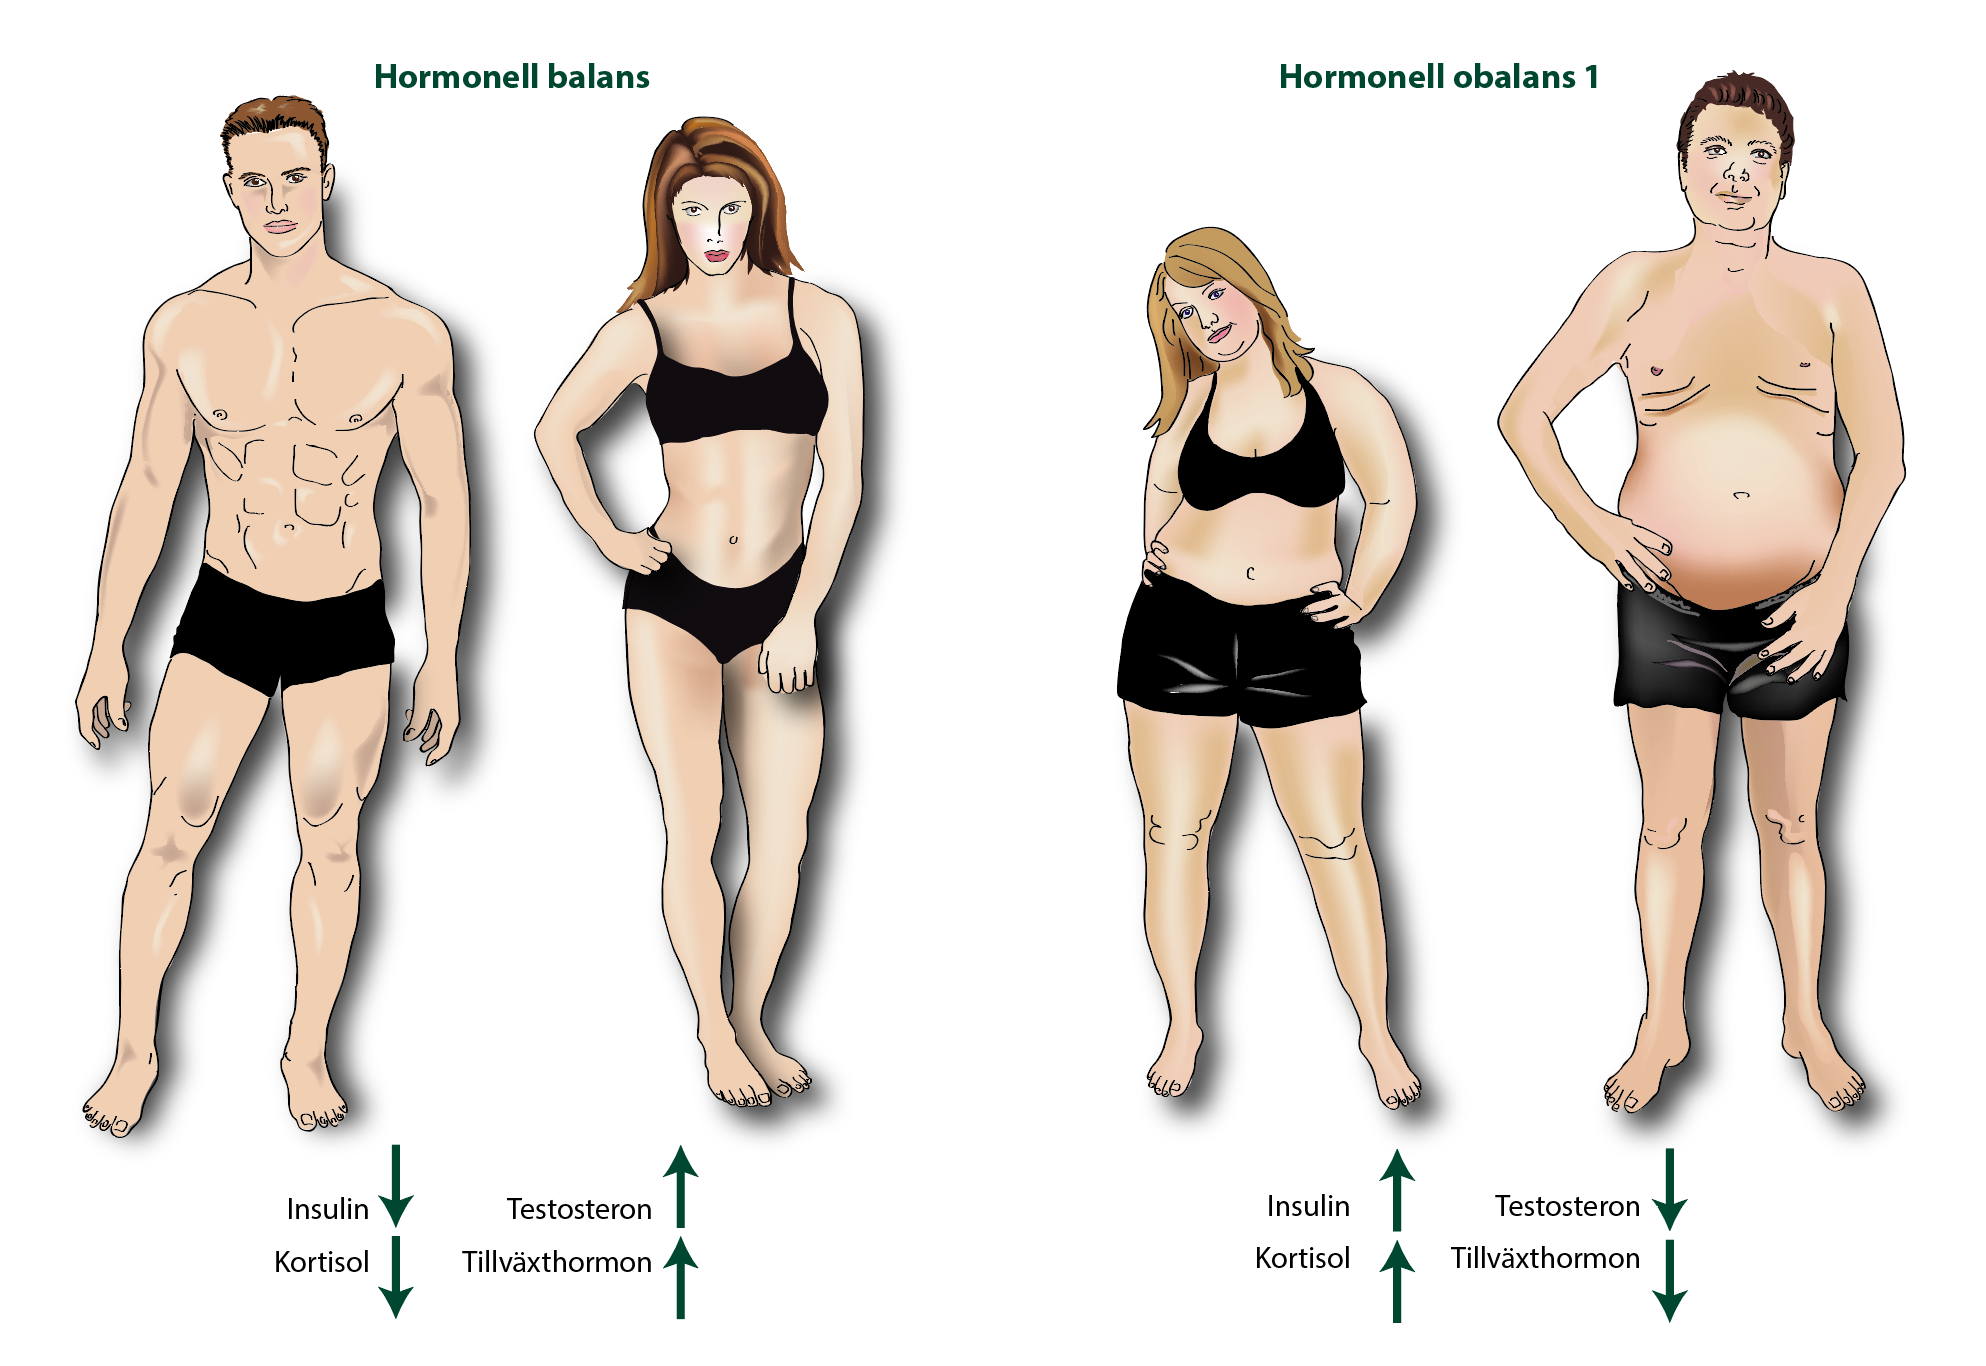 Hormonell balans-obalans